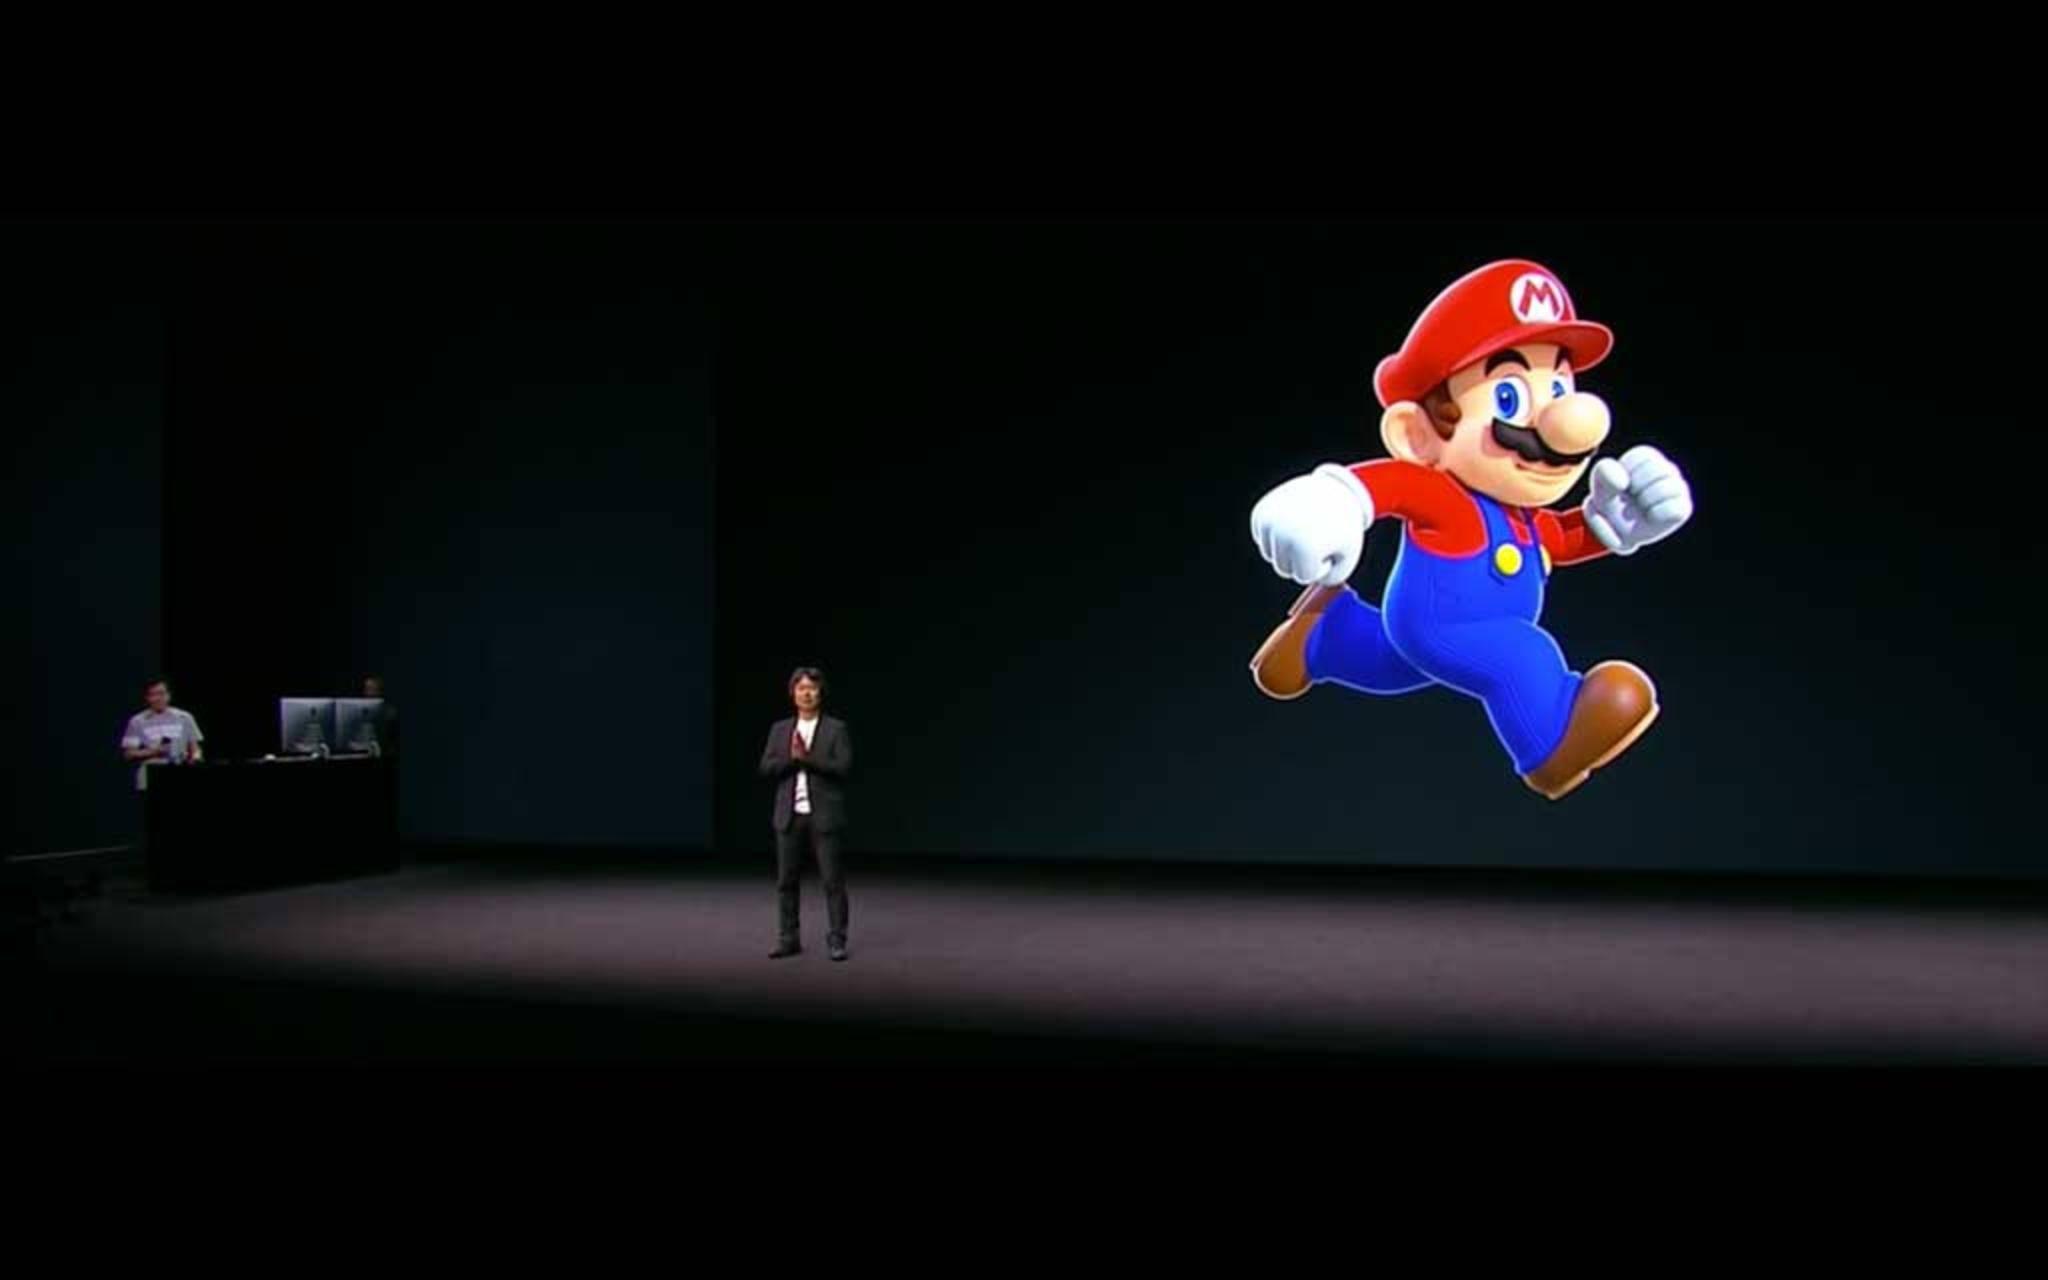 miyamoto-mario.jpg